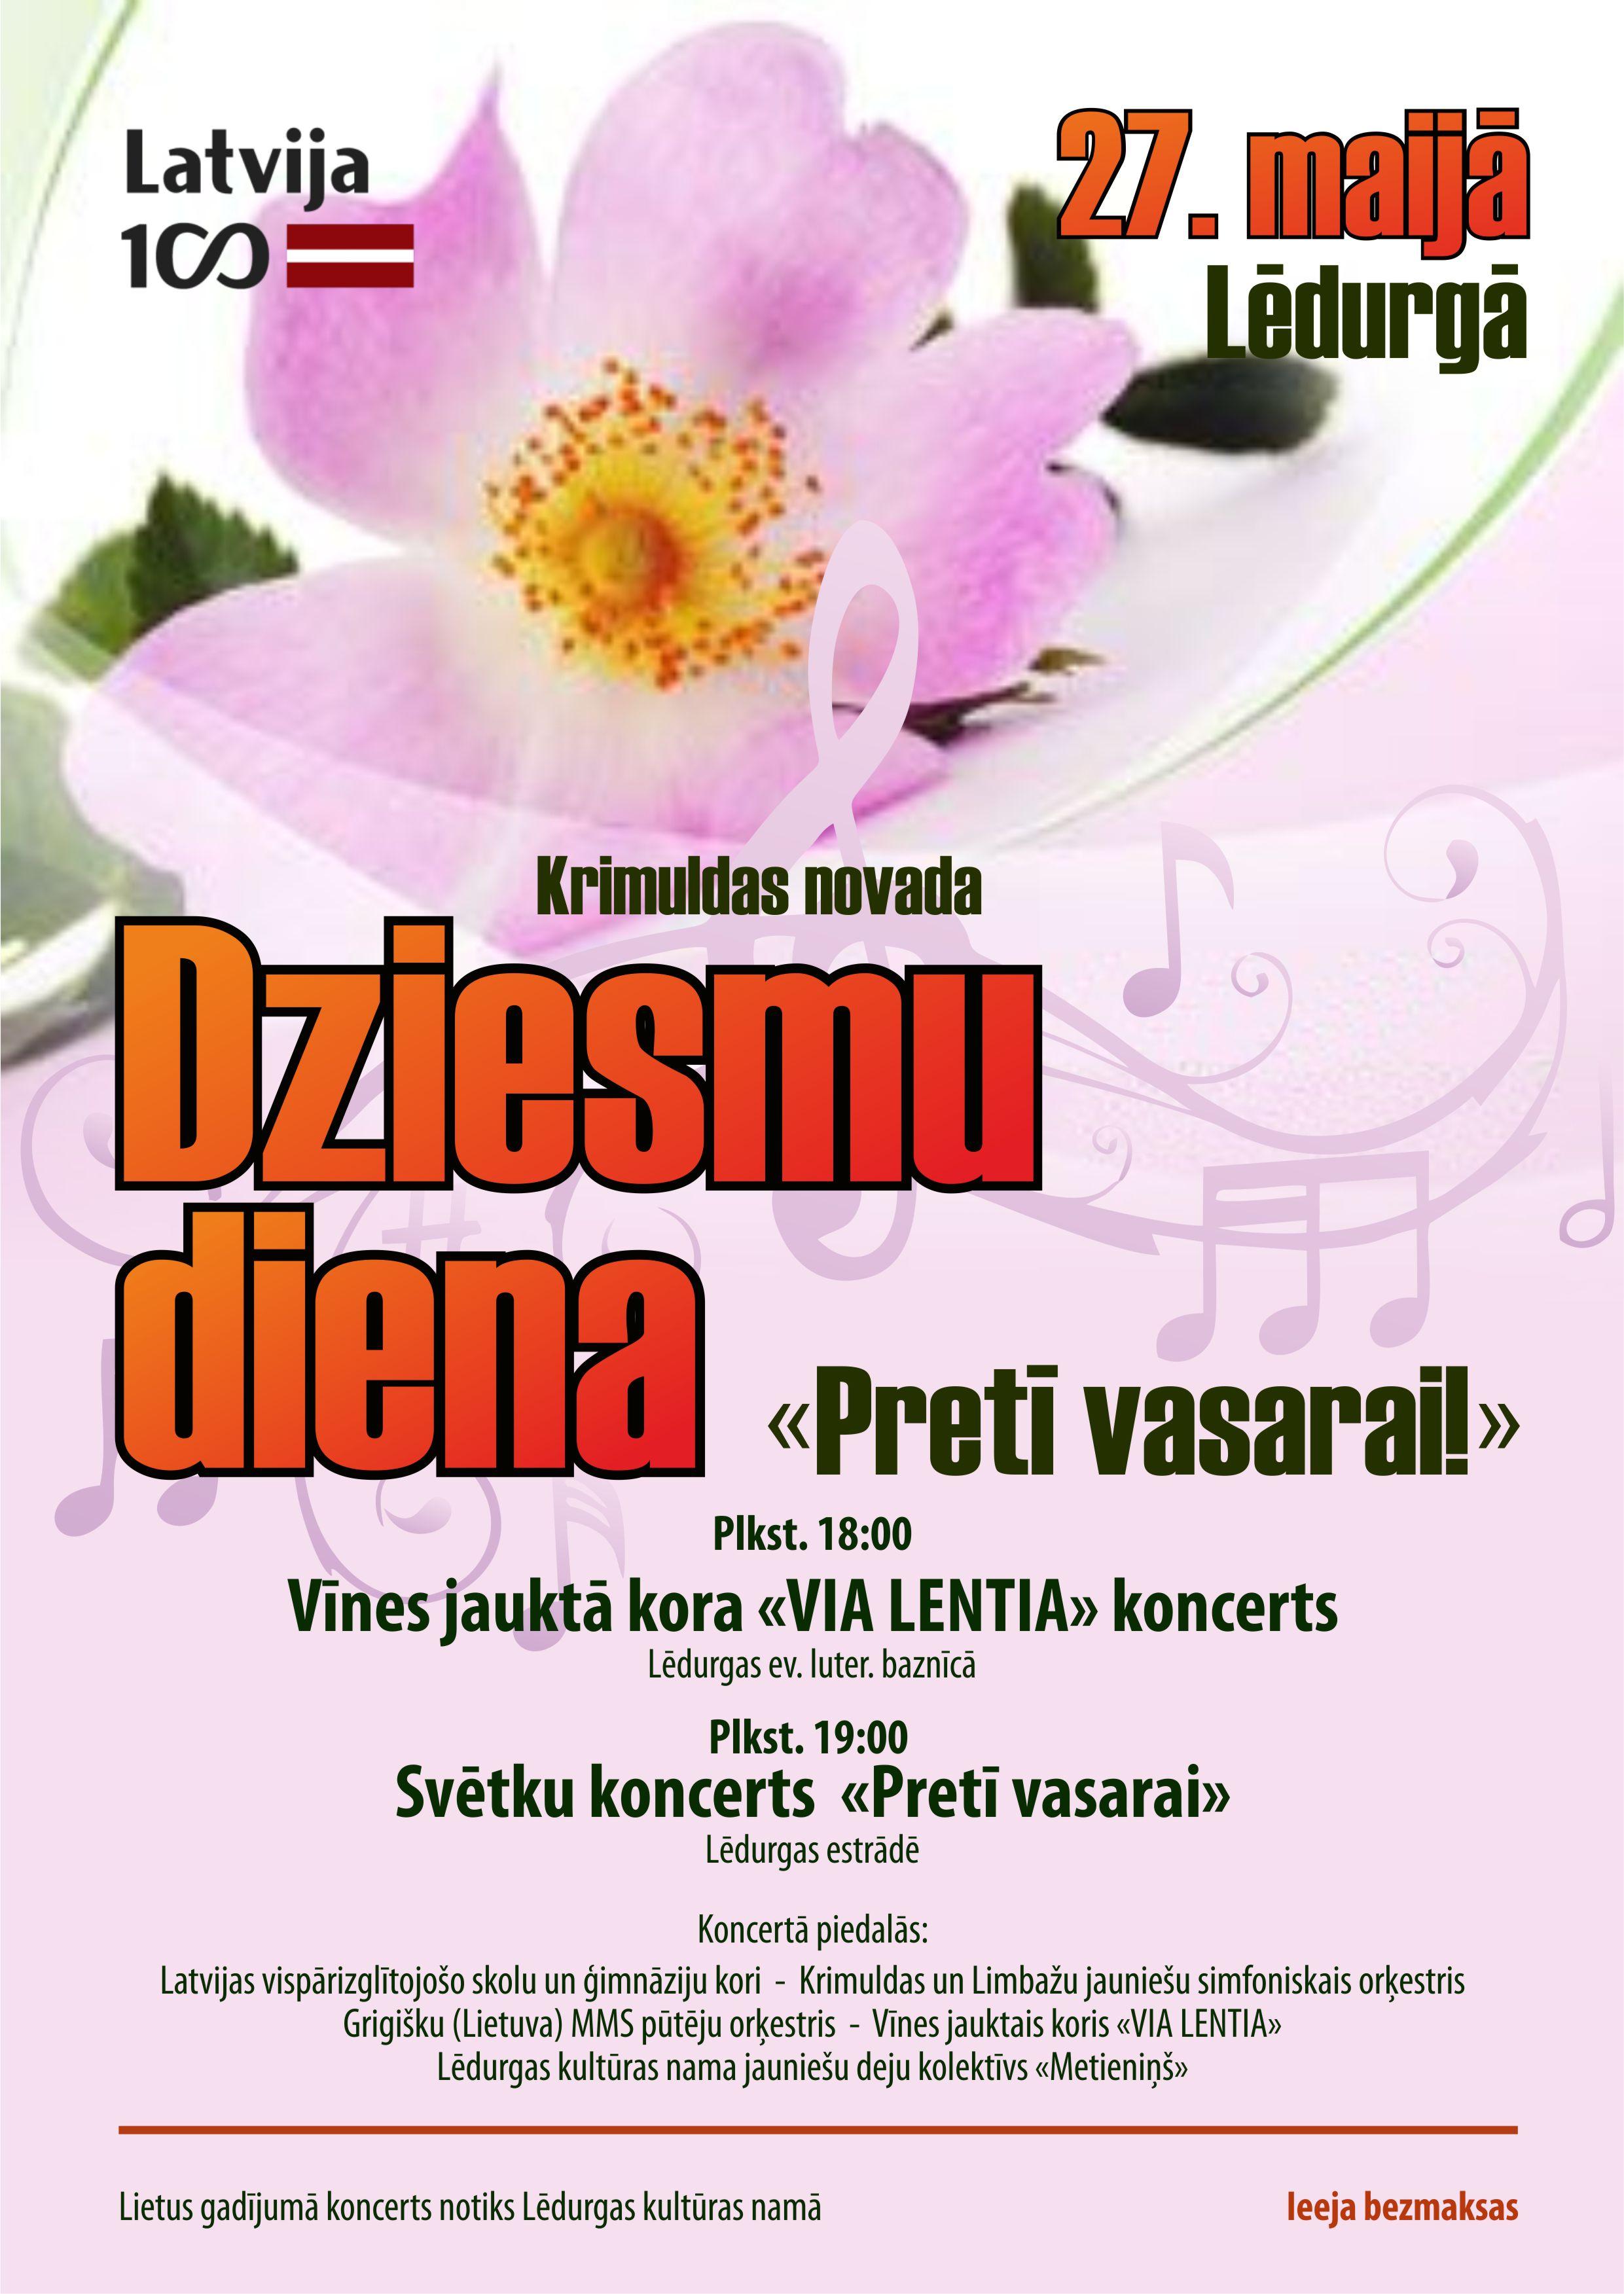 Ledurga_Event_Dziesmu diena afisa_Lettland 2017